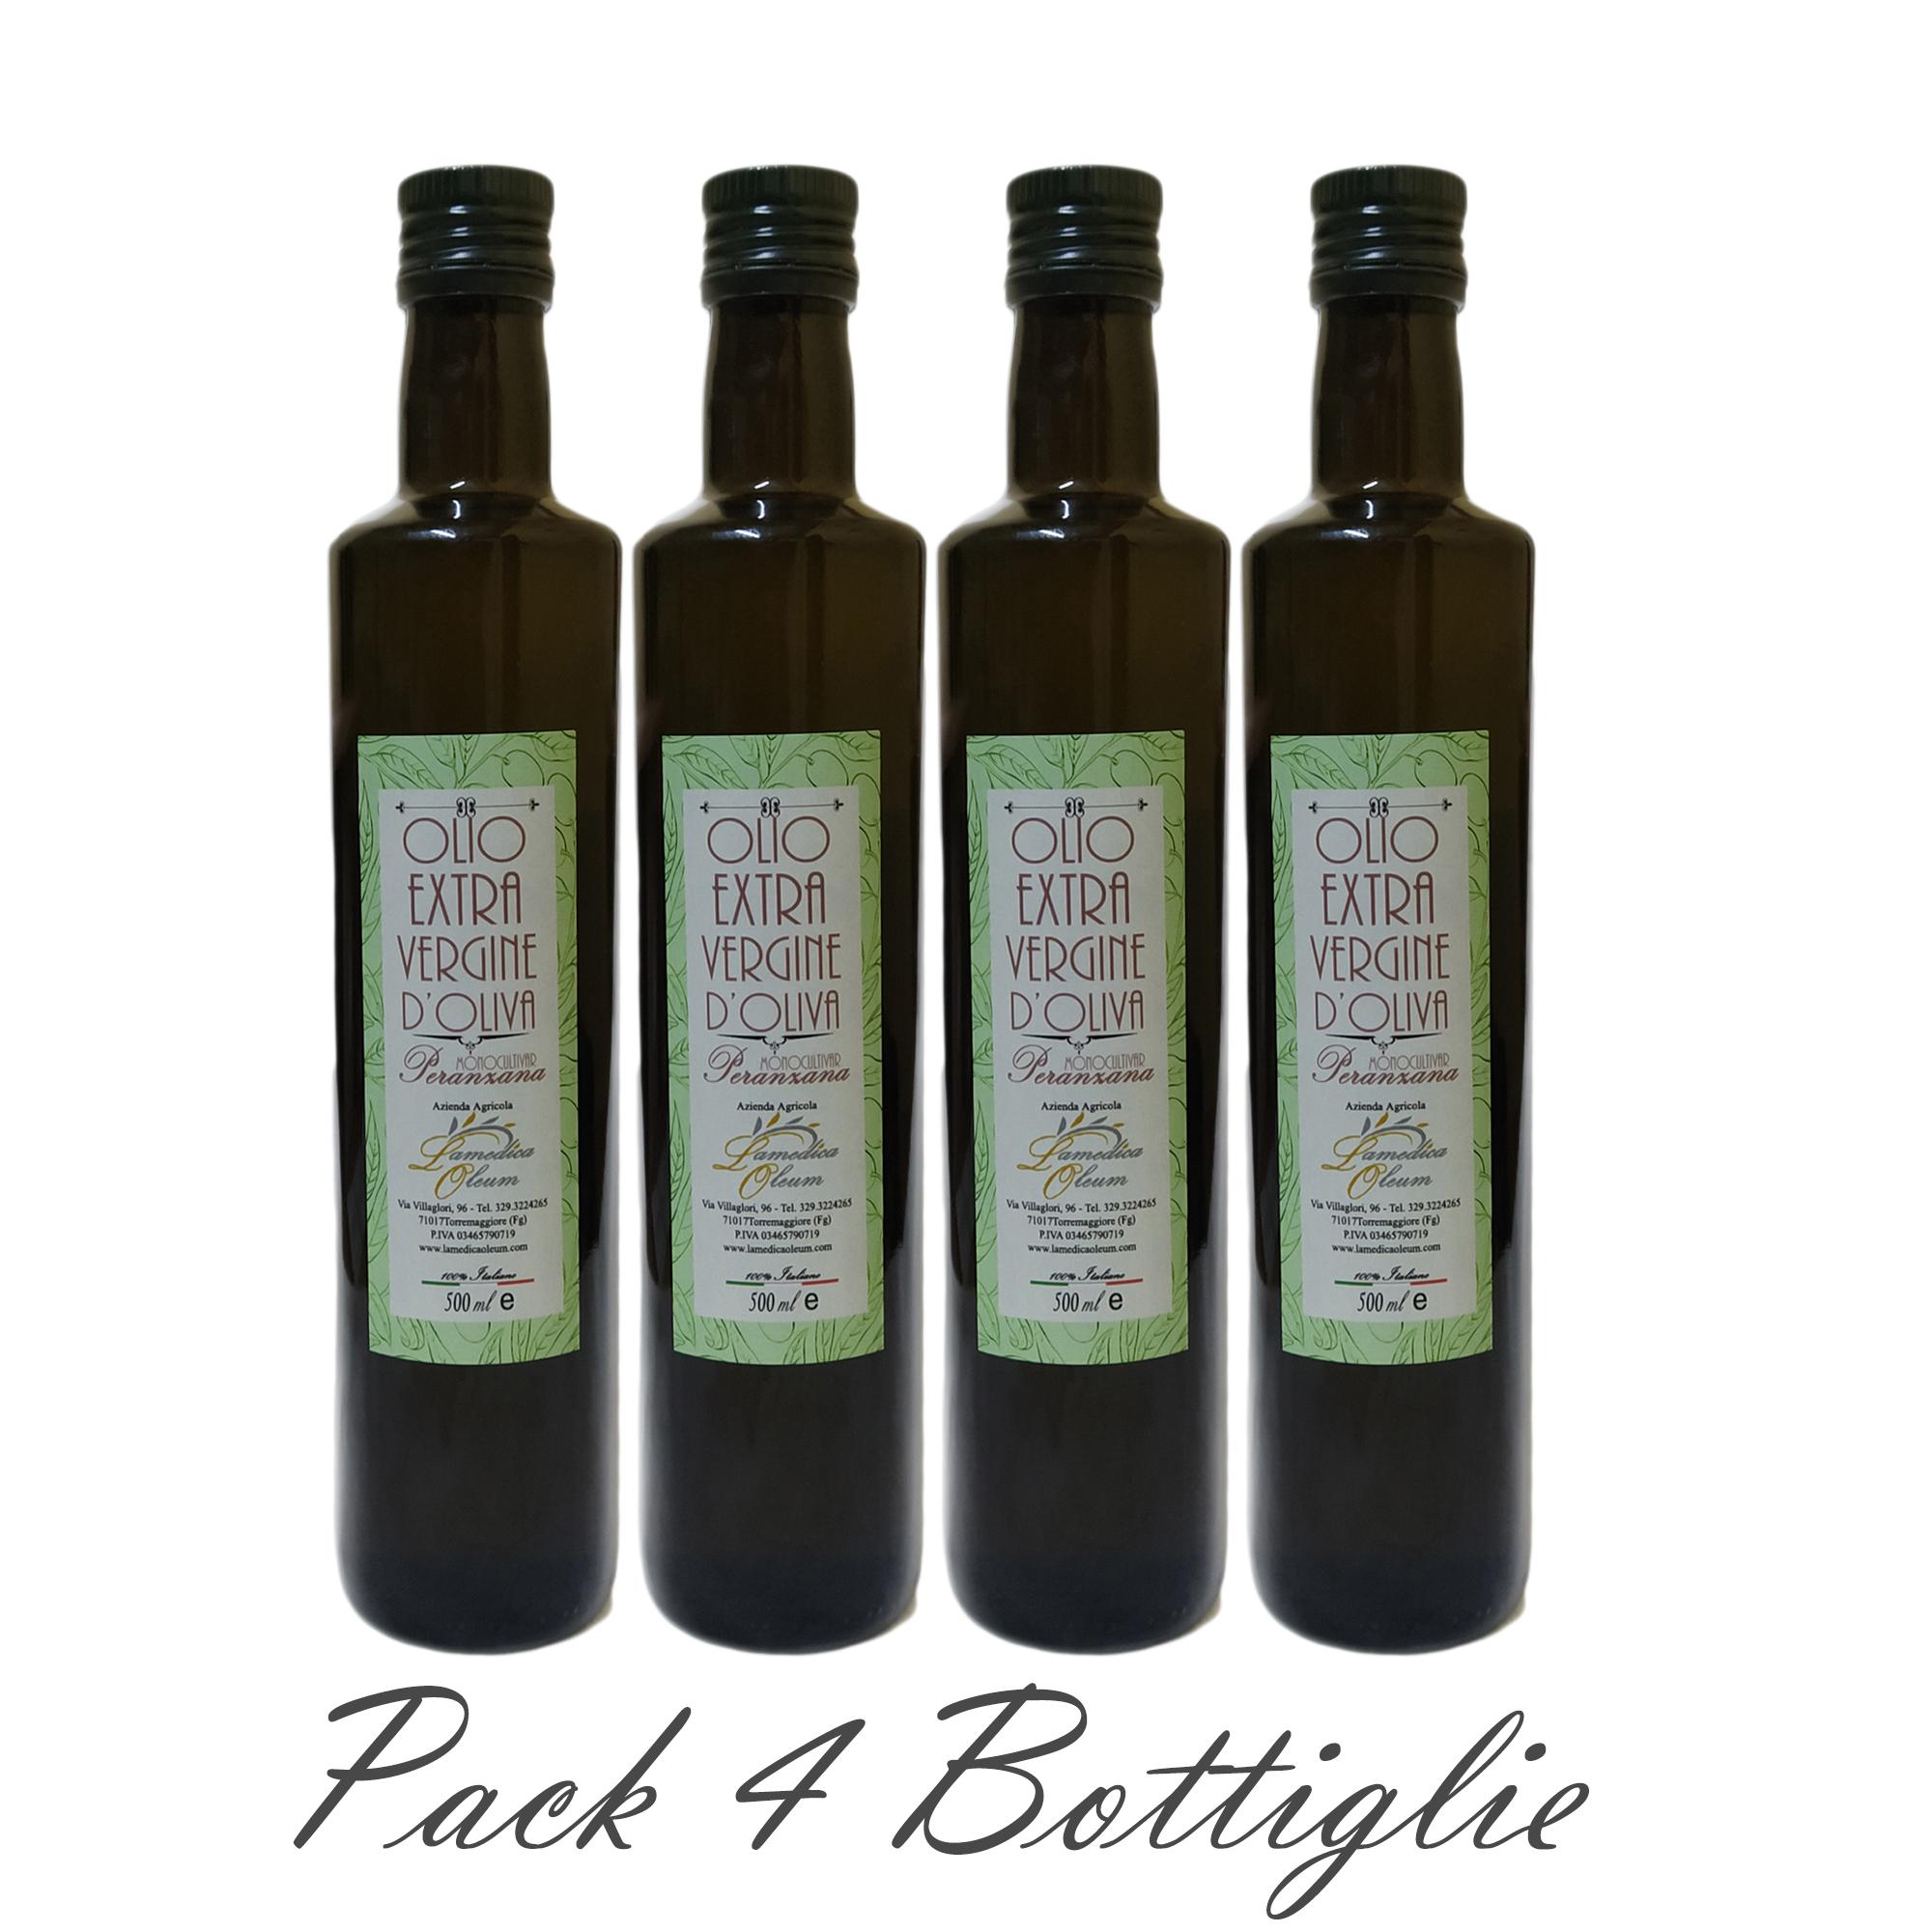 Pack 4 Bottiglie 500ml Olio Extravergine D'Oliva Monocultivar Peranzana